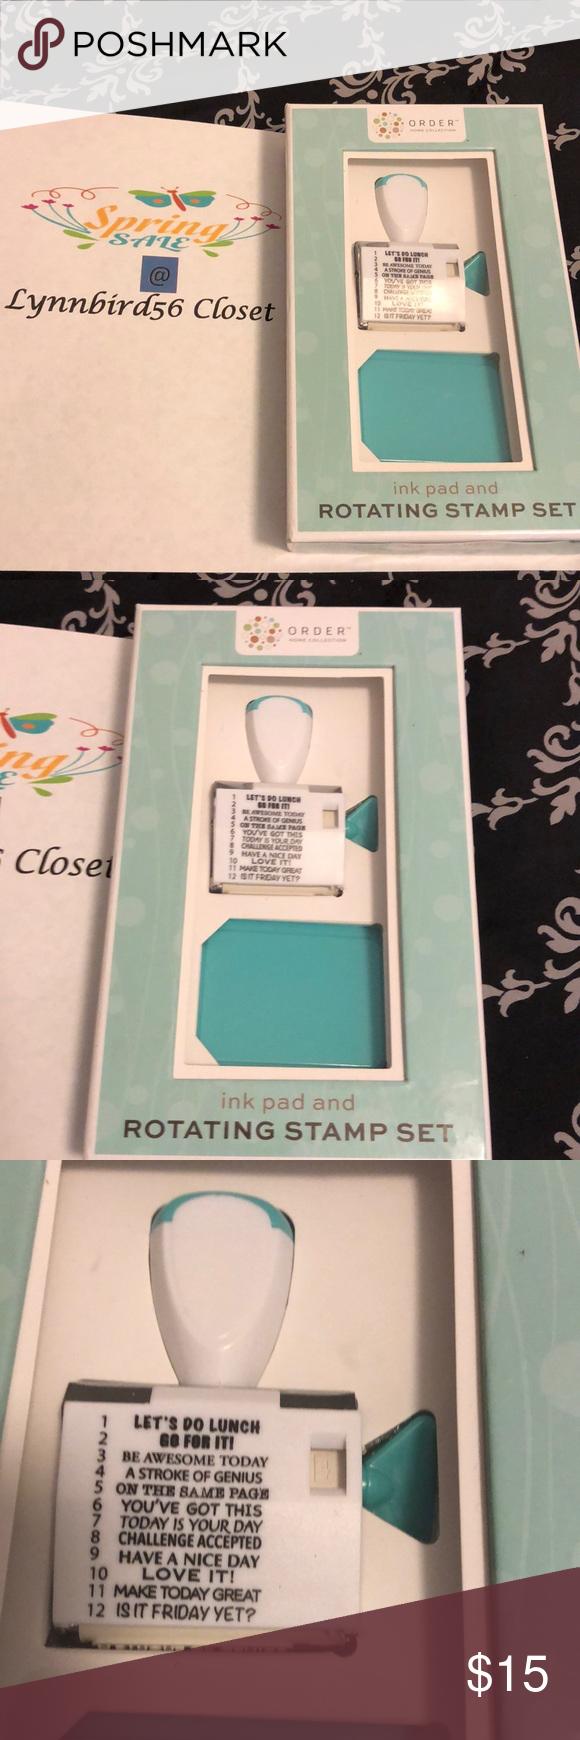 Nwt Stamp Set Stamp Set Stamp Stationery